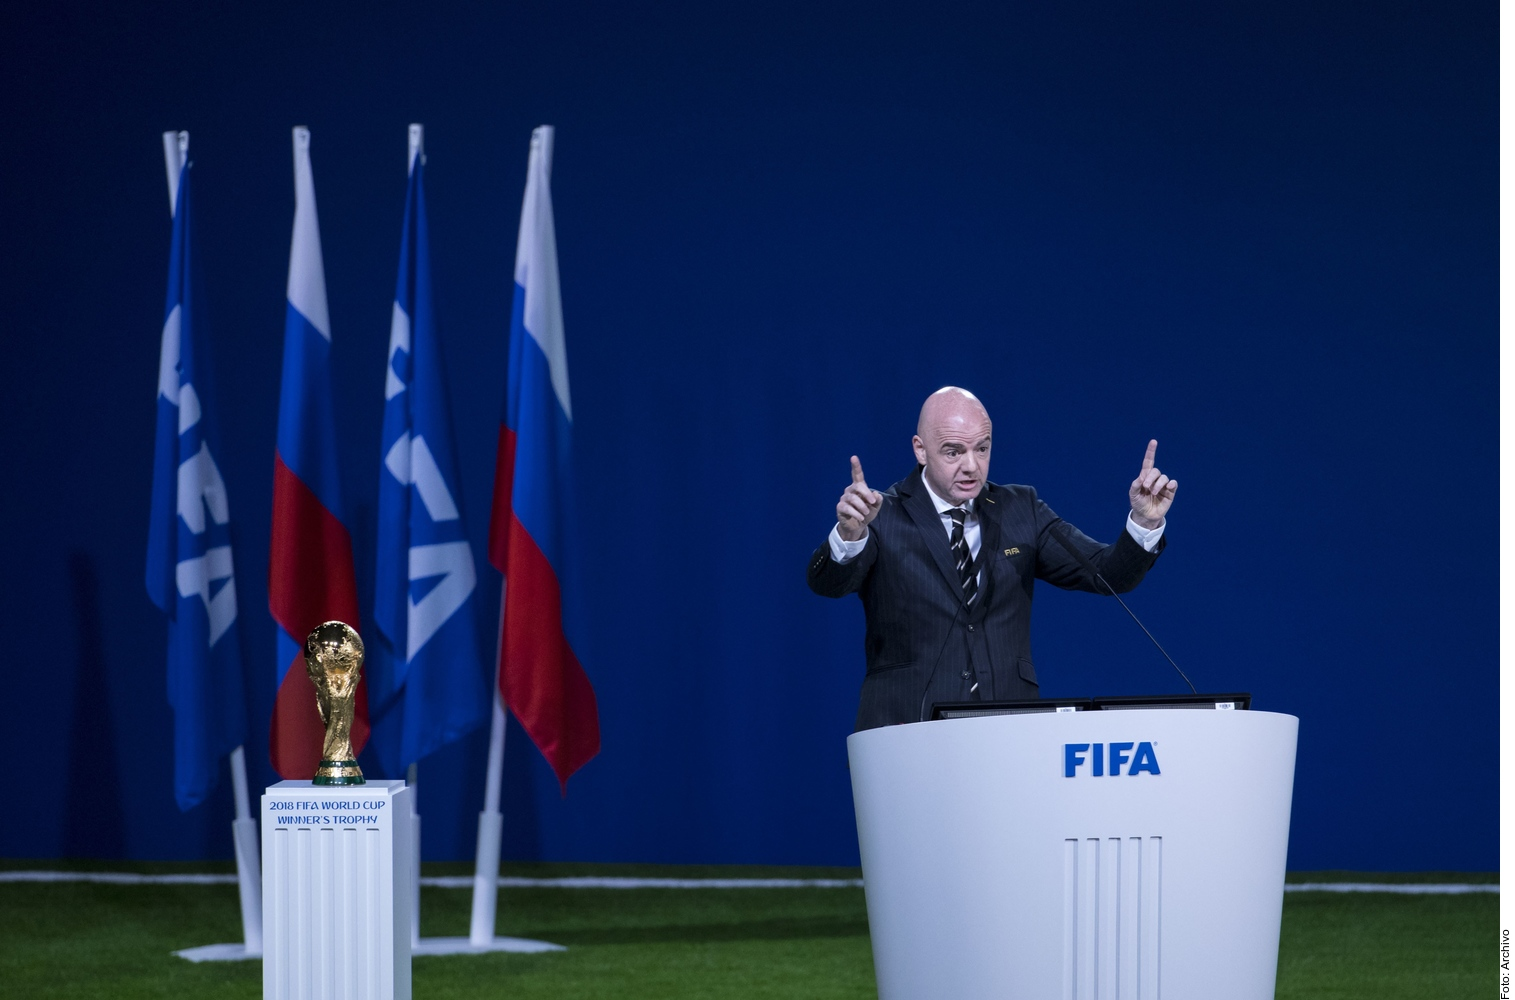 Costumbre idiota: presidente de FIFA  sobre el grito homofóbico